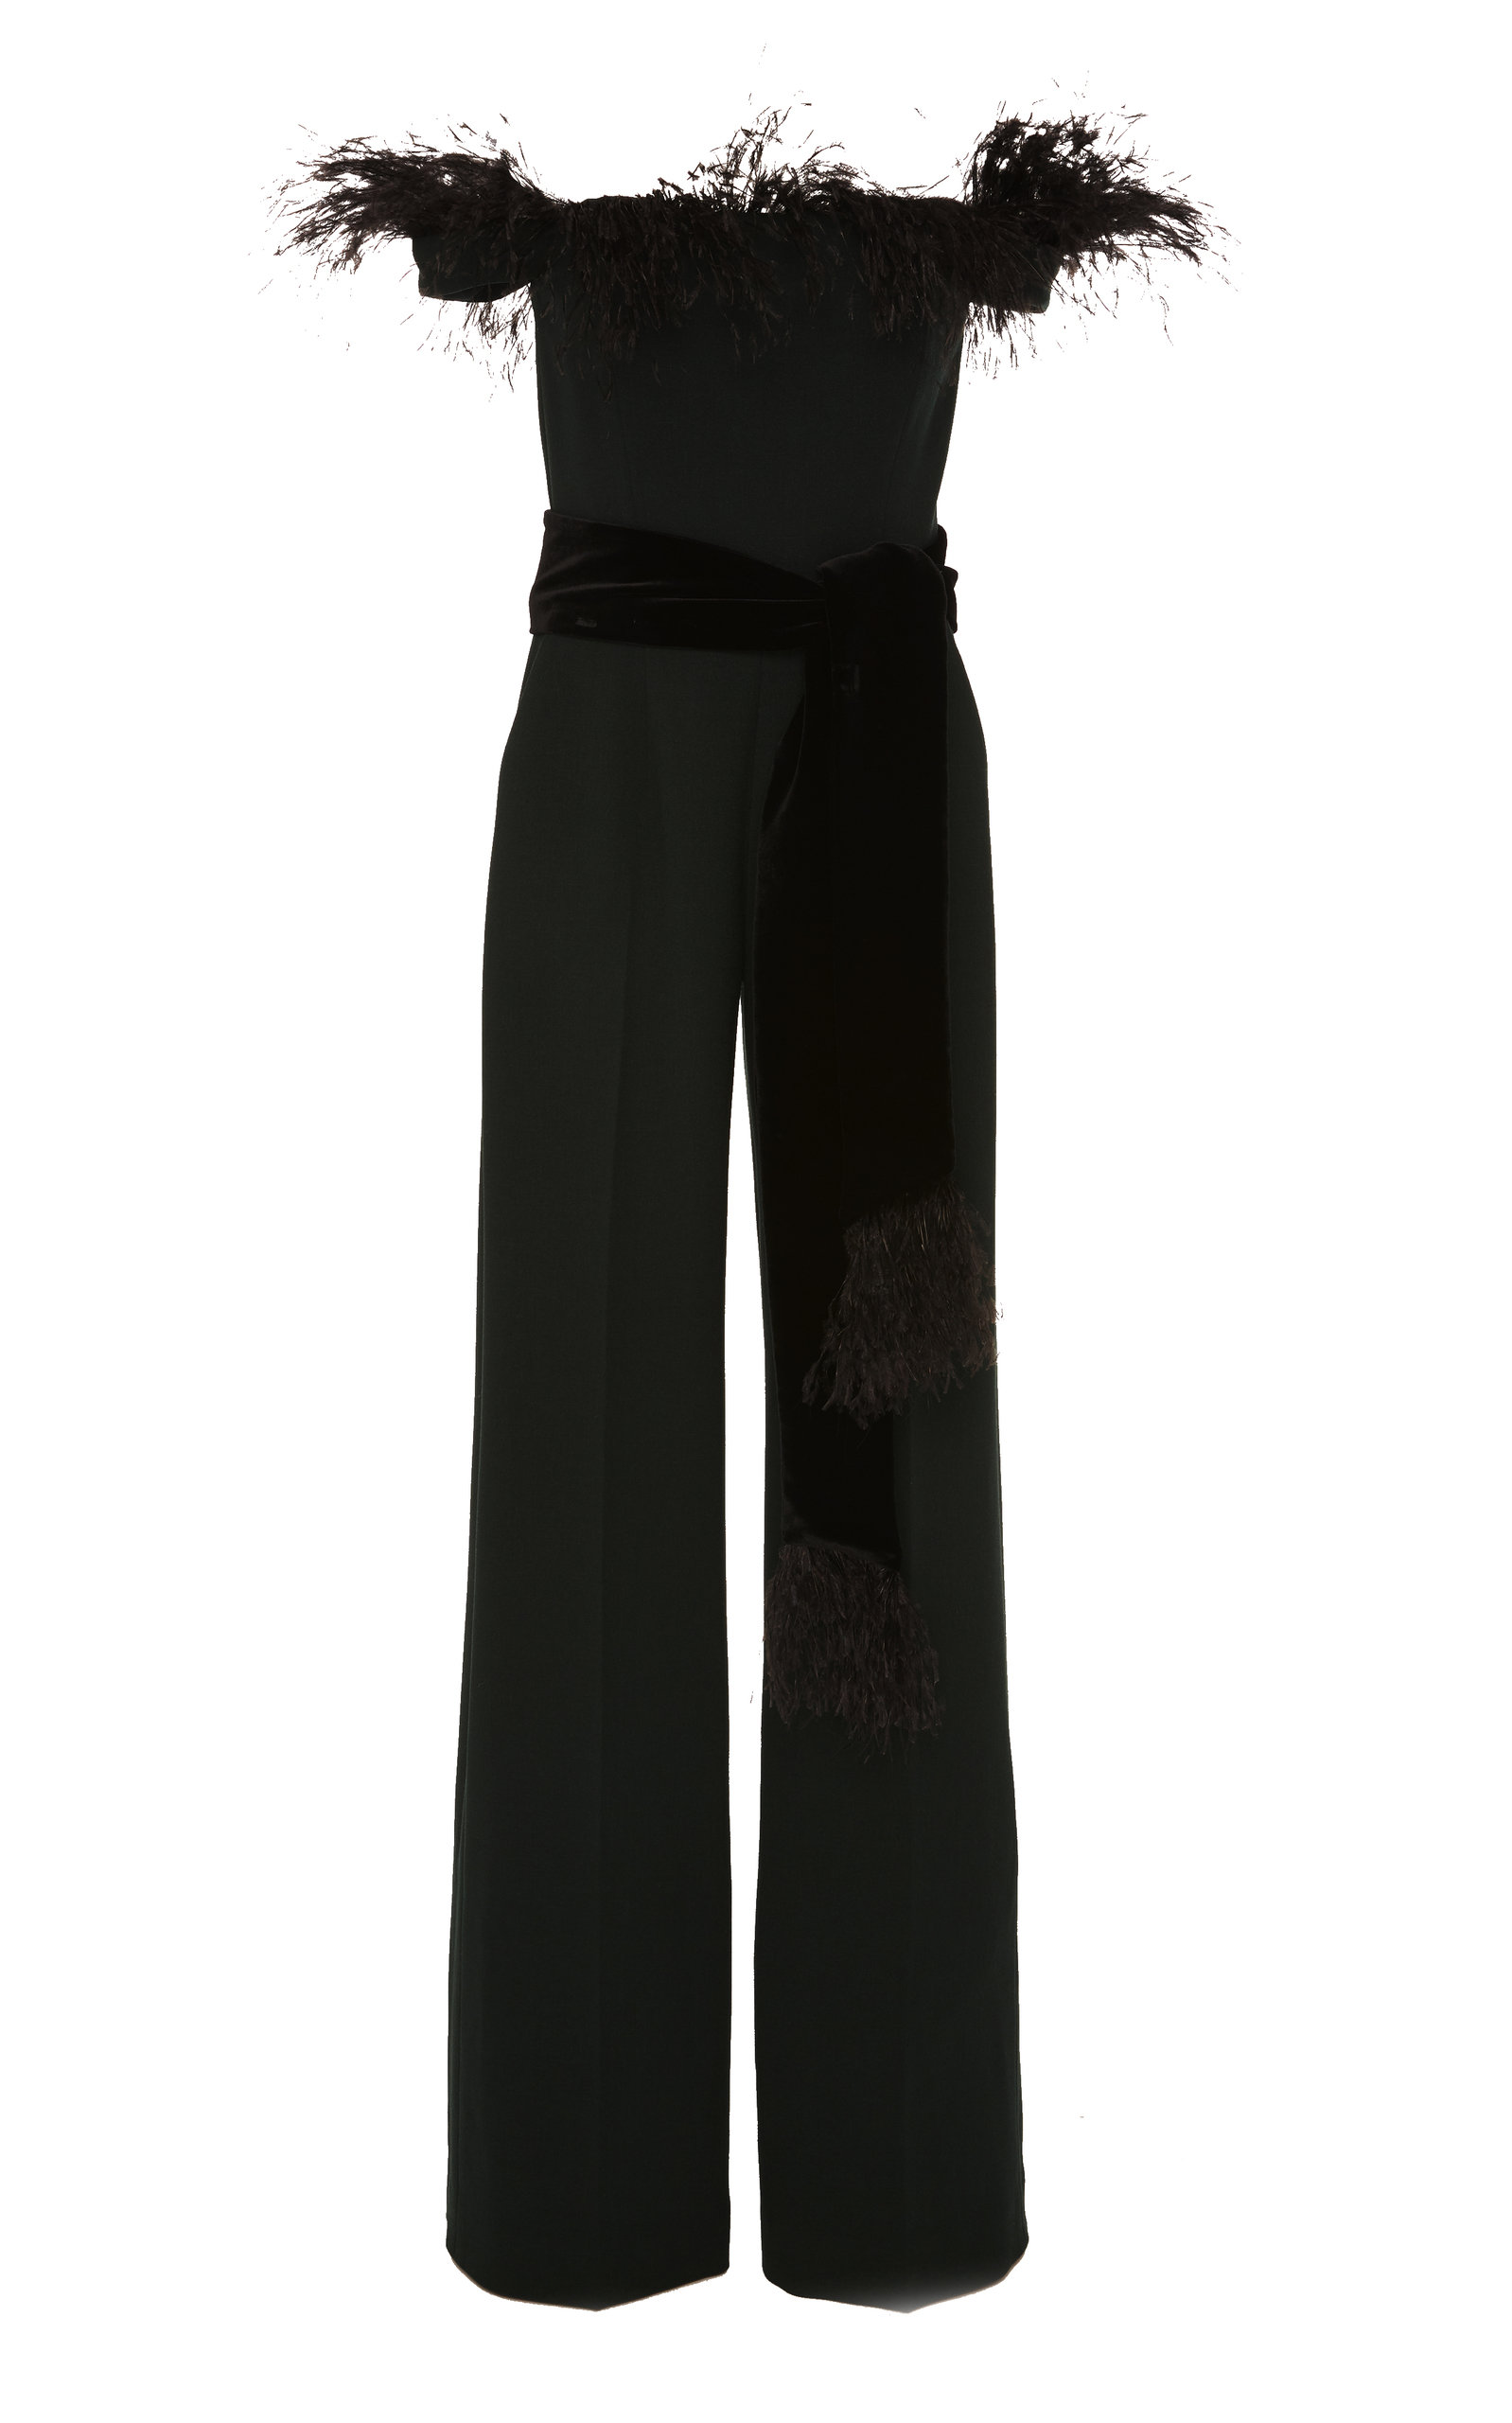 ALEXANDRA VIDAL M'O Exclusive Off-The-Shoulder Feather-Embellished Crepe Jumpsuit in Dark Green